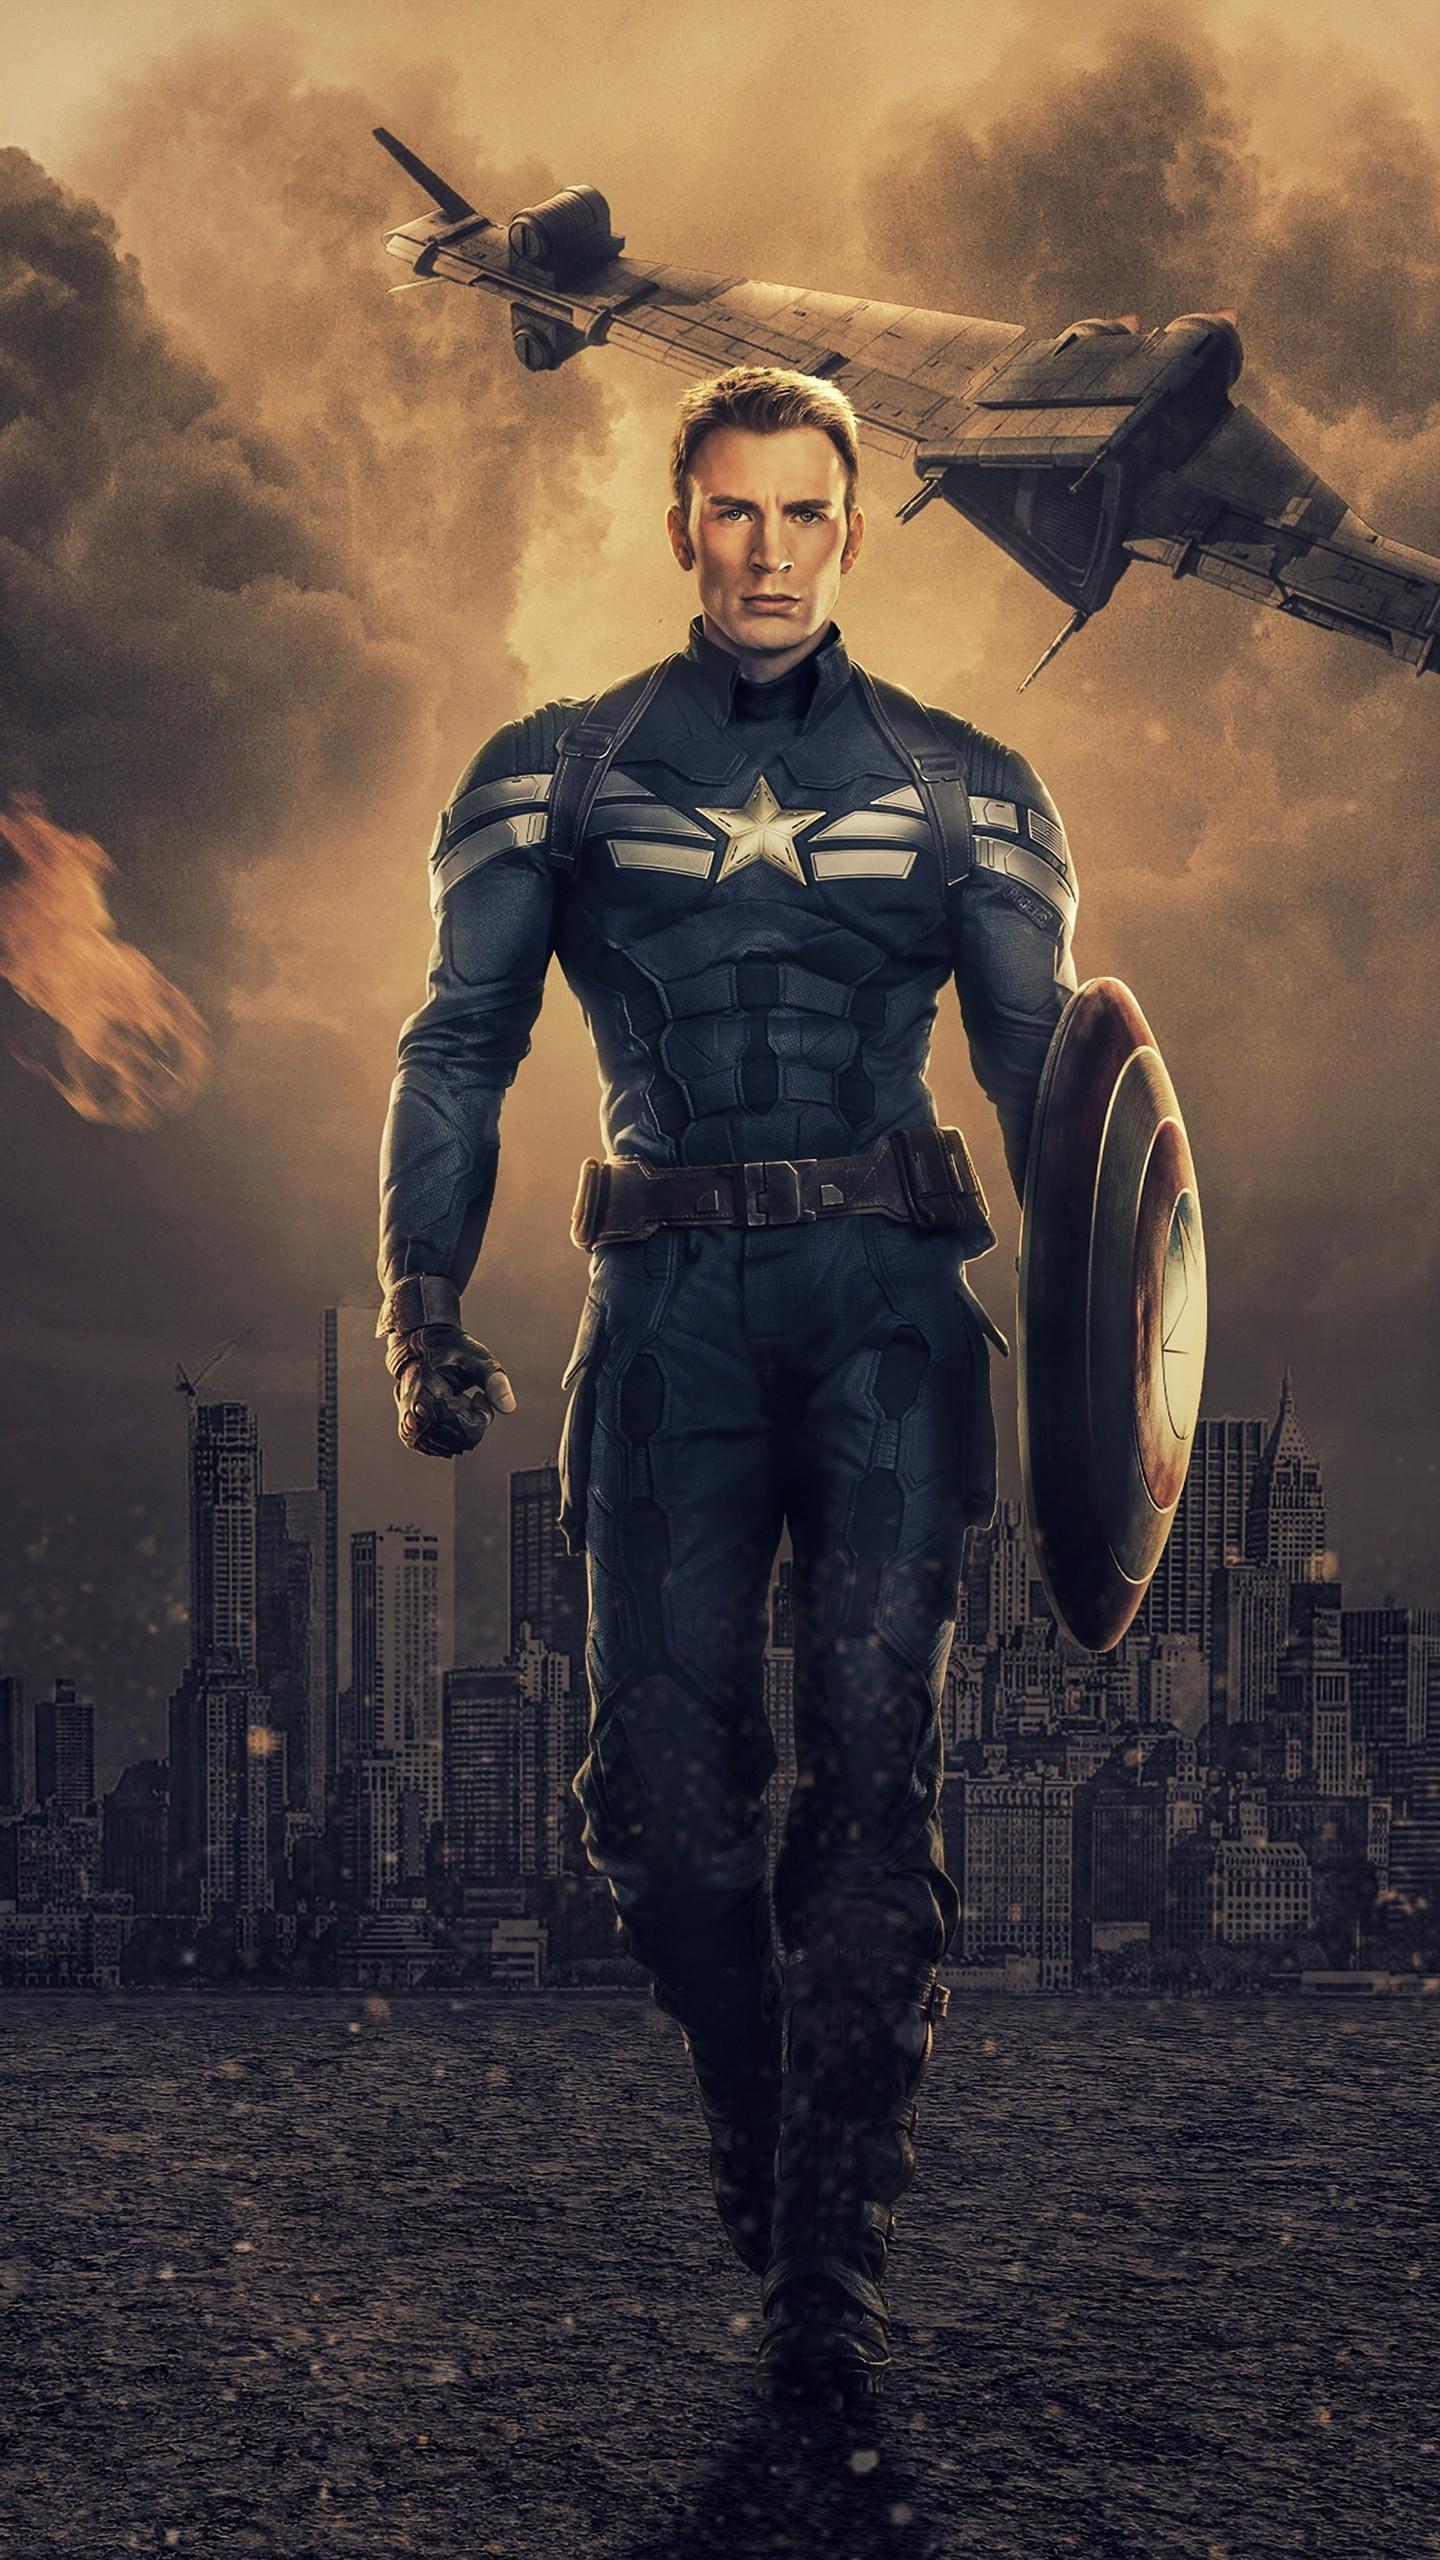 Hd 3d Snake Wallpapers Chris Evans As Captain America 4k Wallpapers Hd